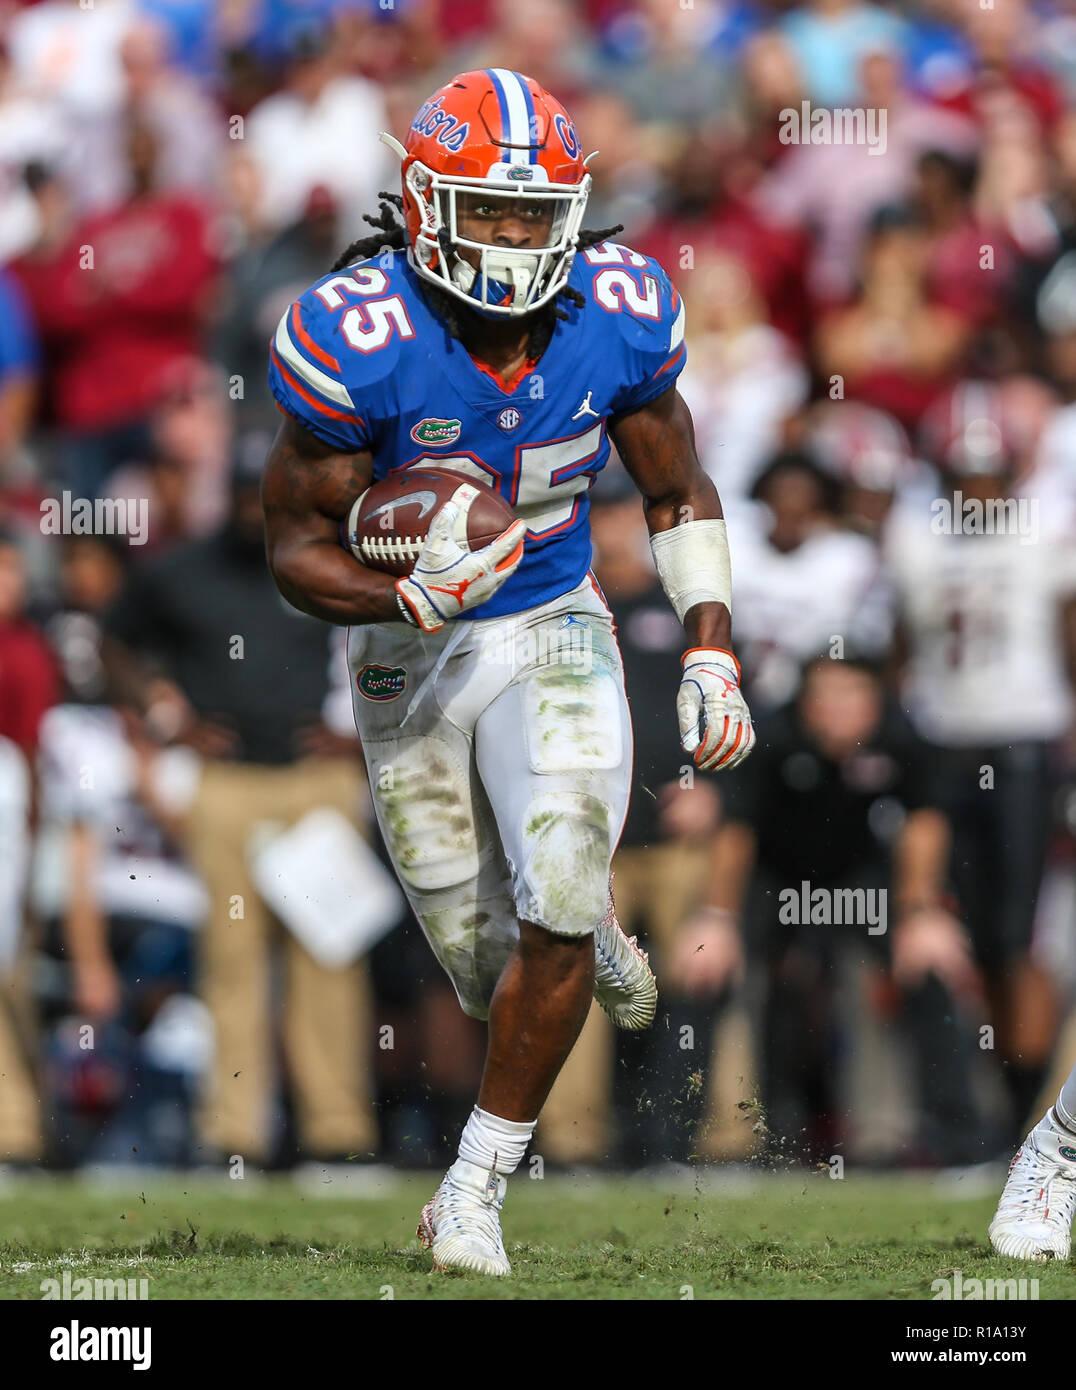 437a27d8b69 Nov 10 - Gainesville, FL, U.S.: Florida Gators running back Jordan Scarlett  (